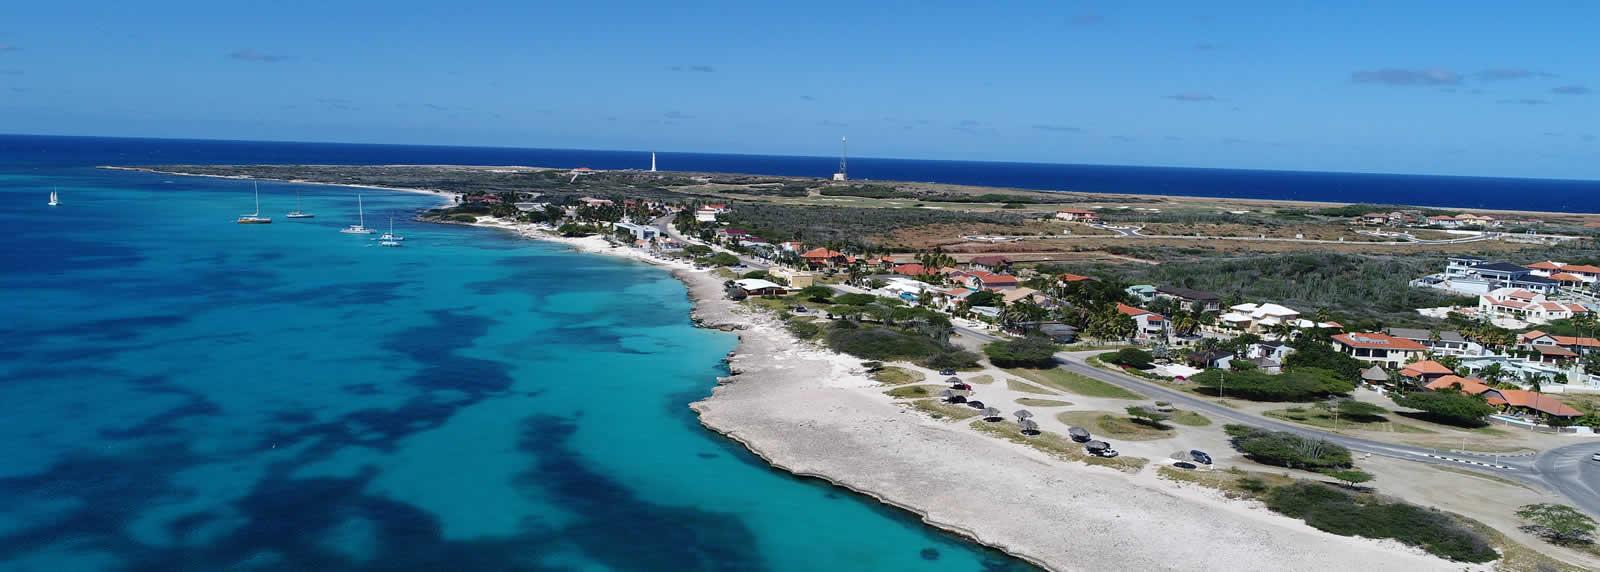 https://arubapalmsrealtors.com/wp-content/uploads/2018/01/hero-image-of-aruba-beach-real-estate.jpg